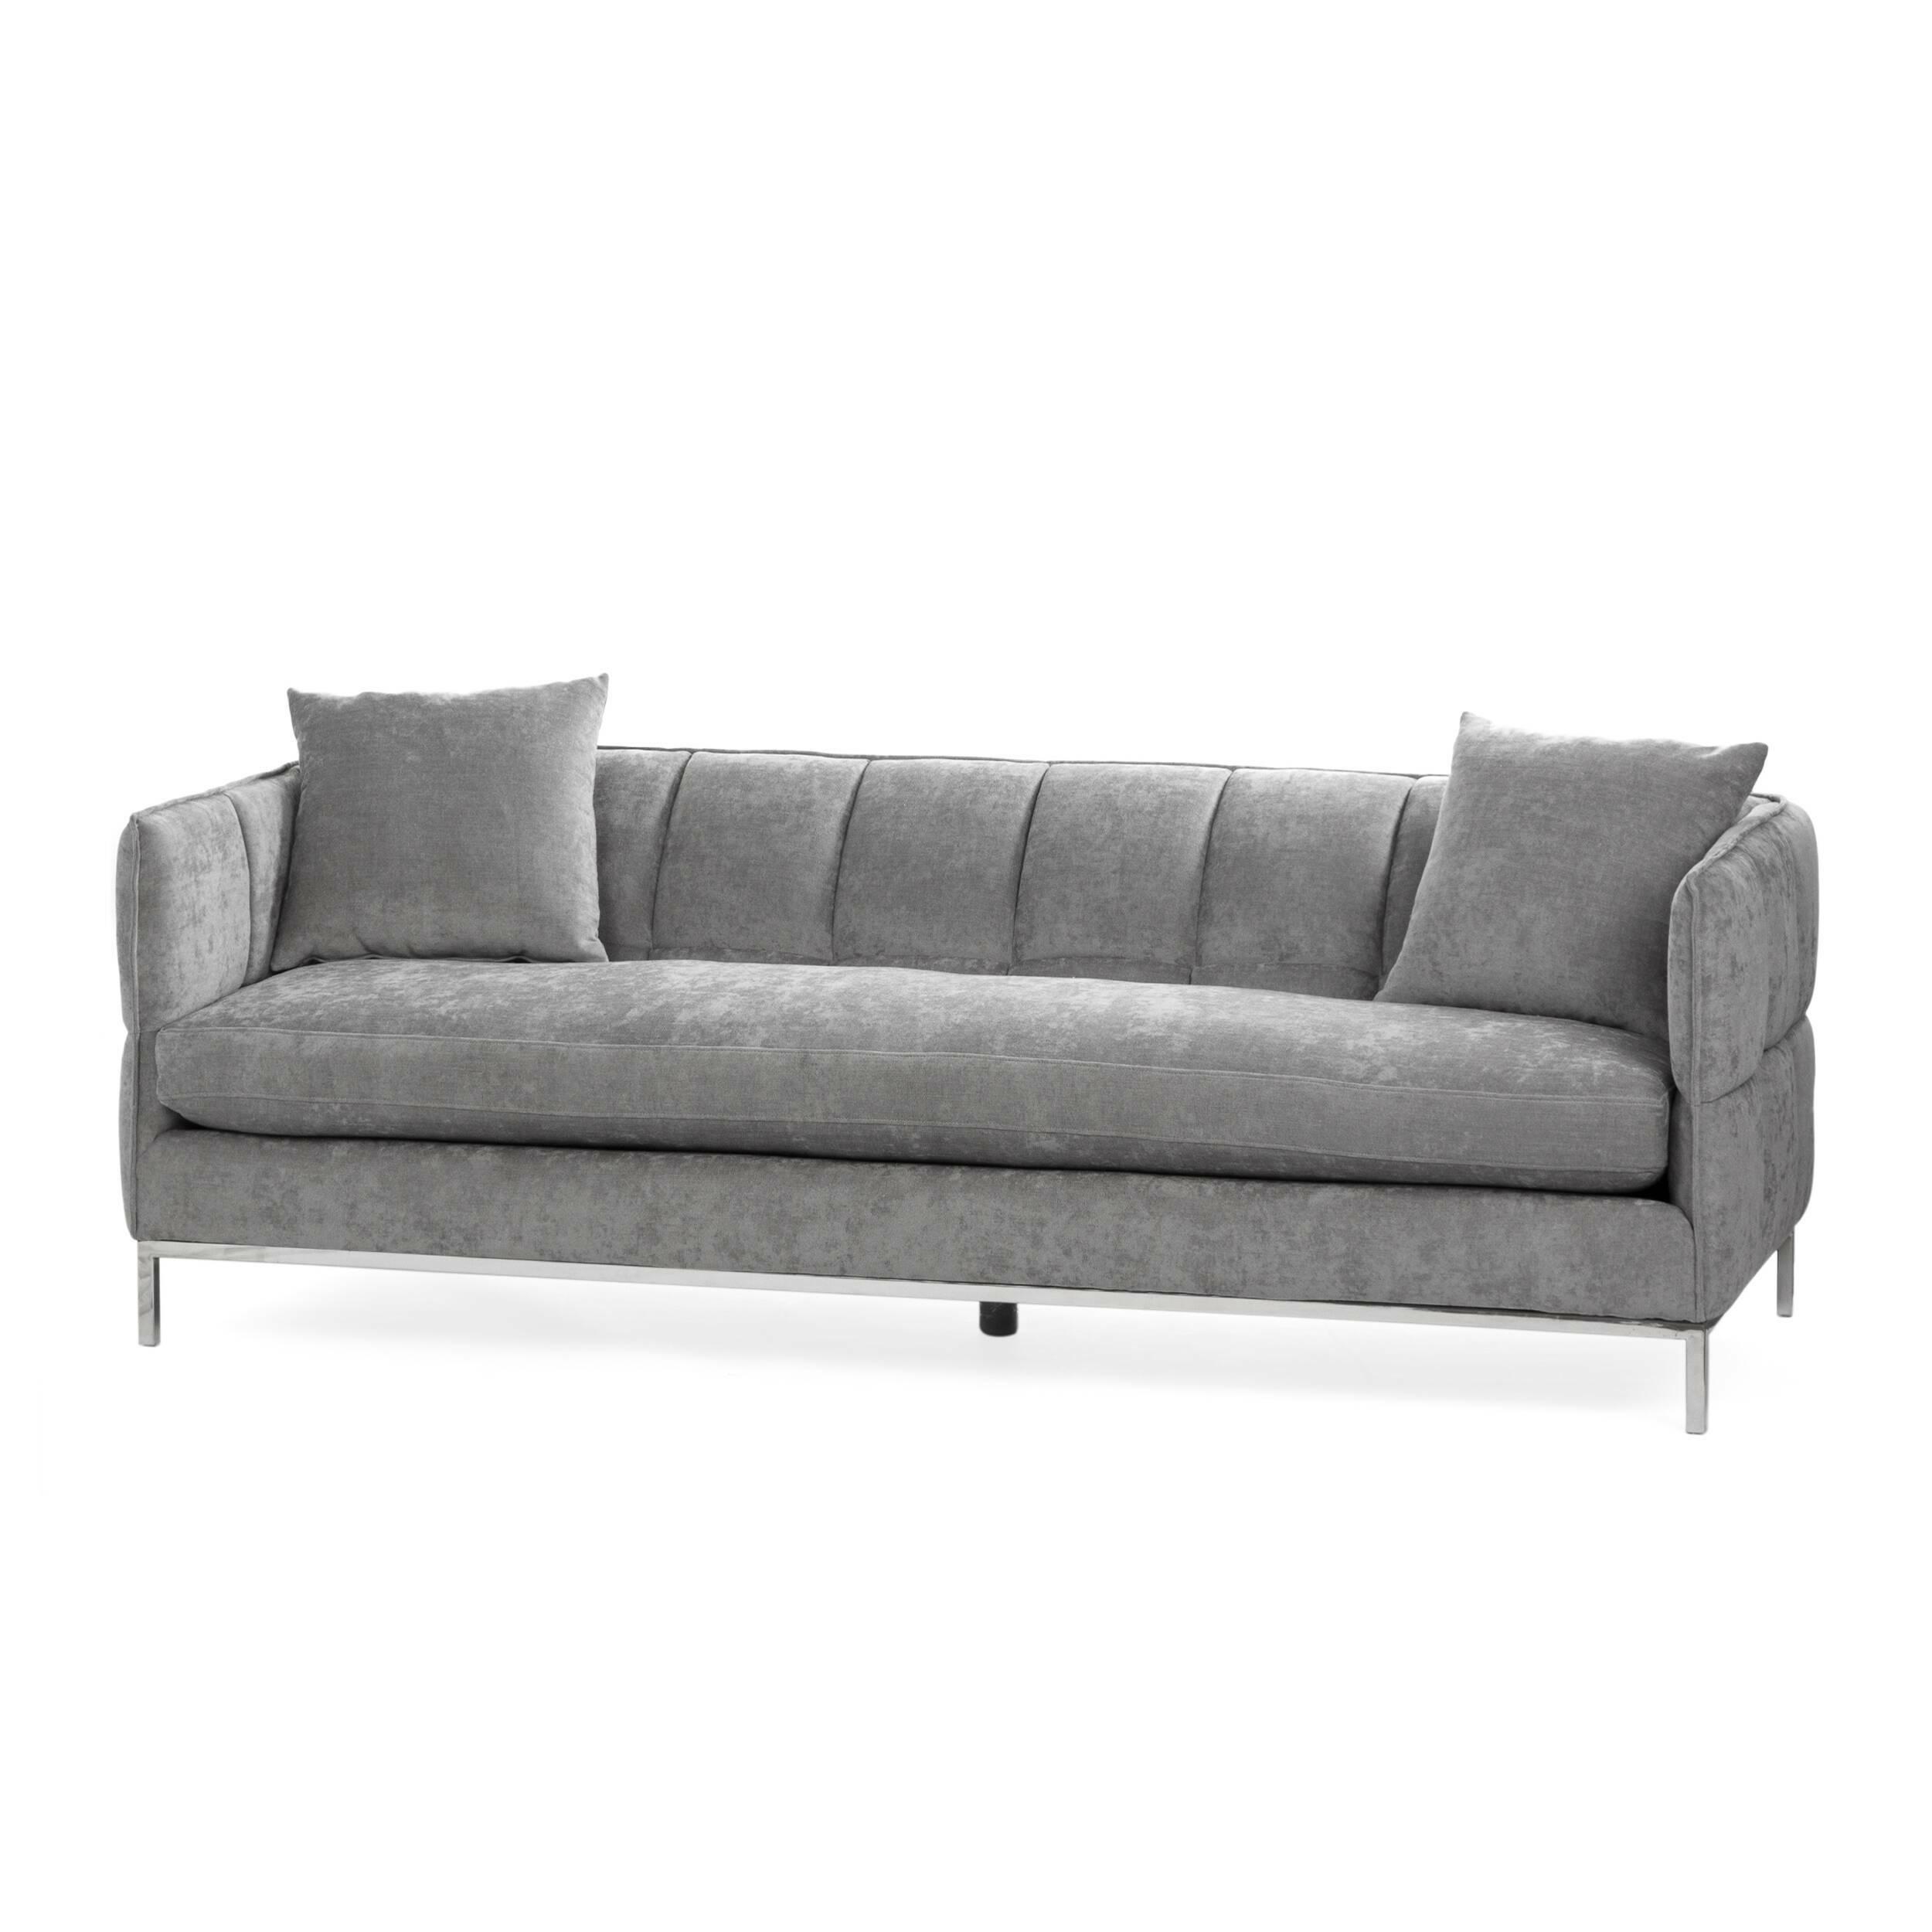 Диван FS030-30 Casper Sofa